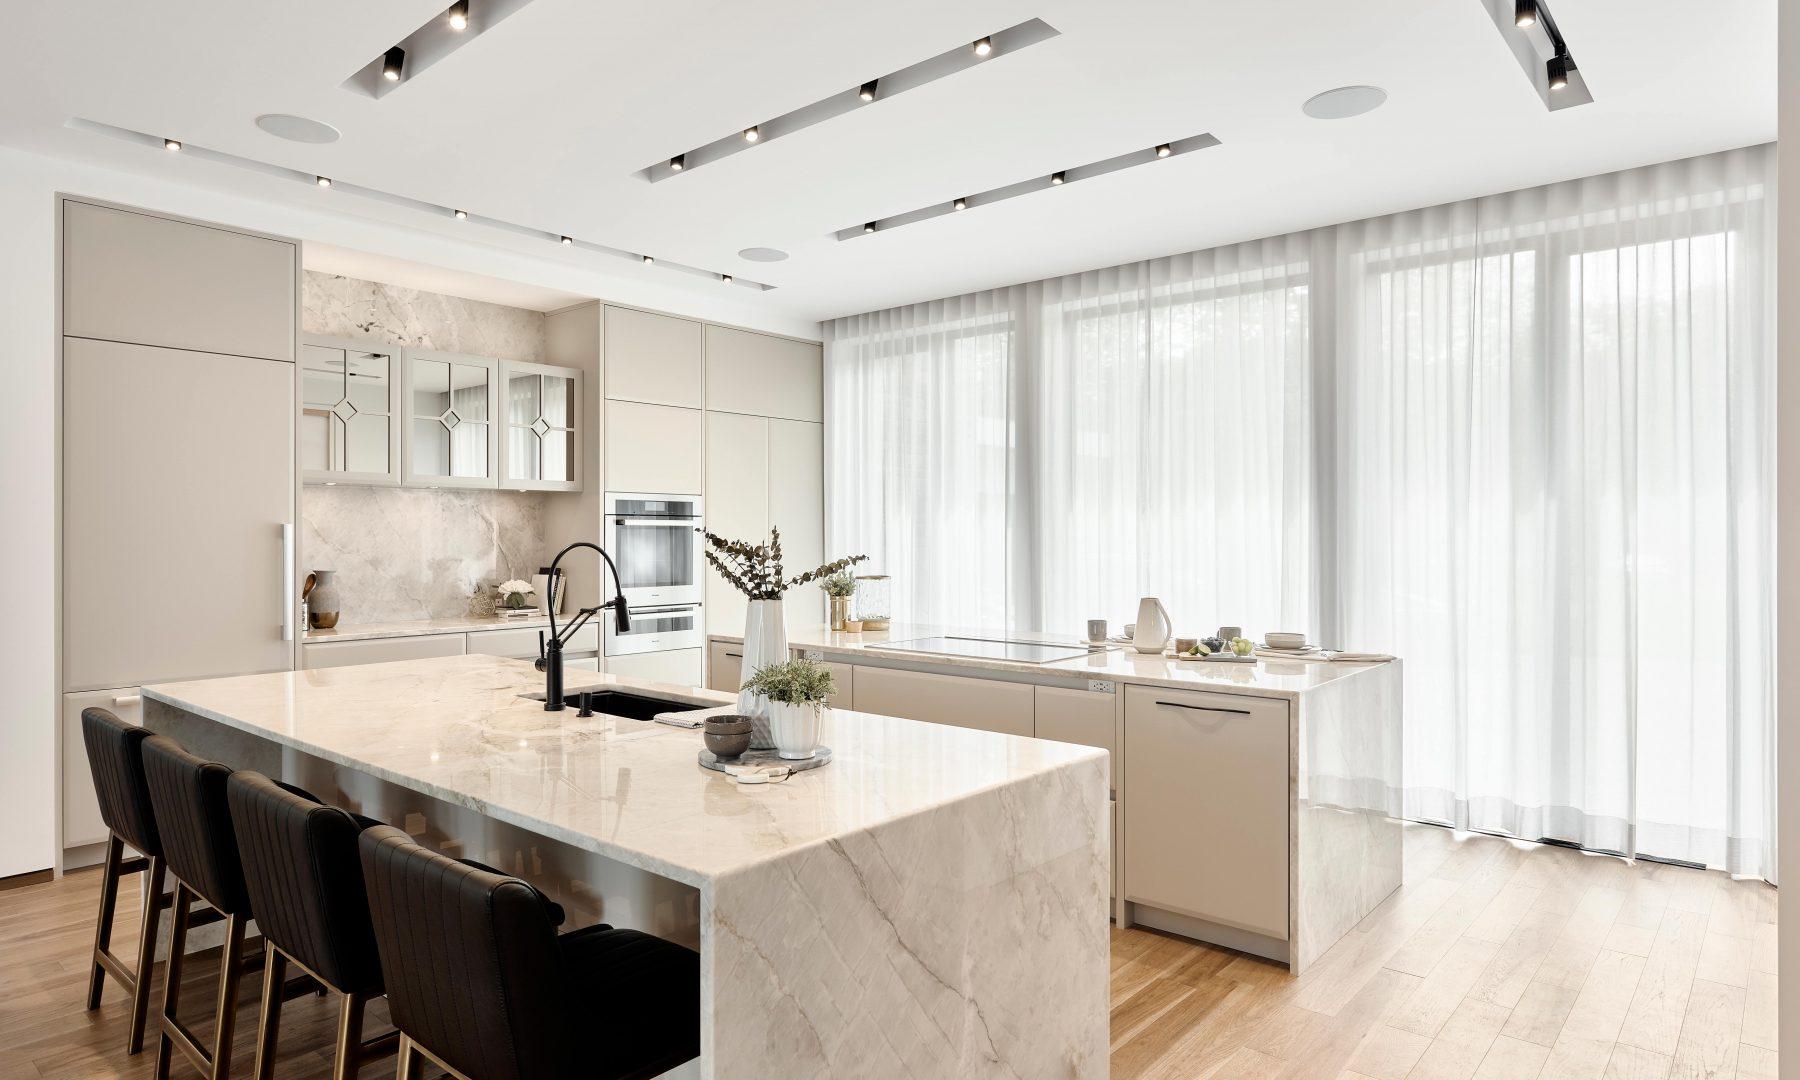 Cabico Custom Cabinets - Projet cuisine Portobello - vue d'ensemble